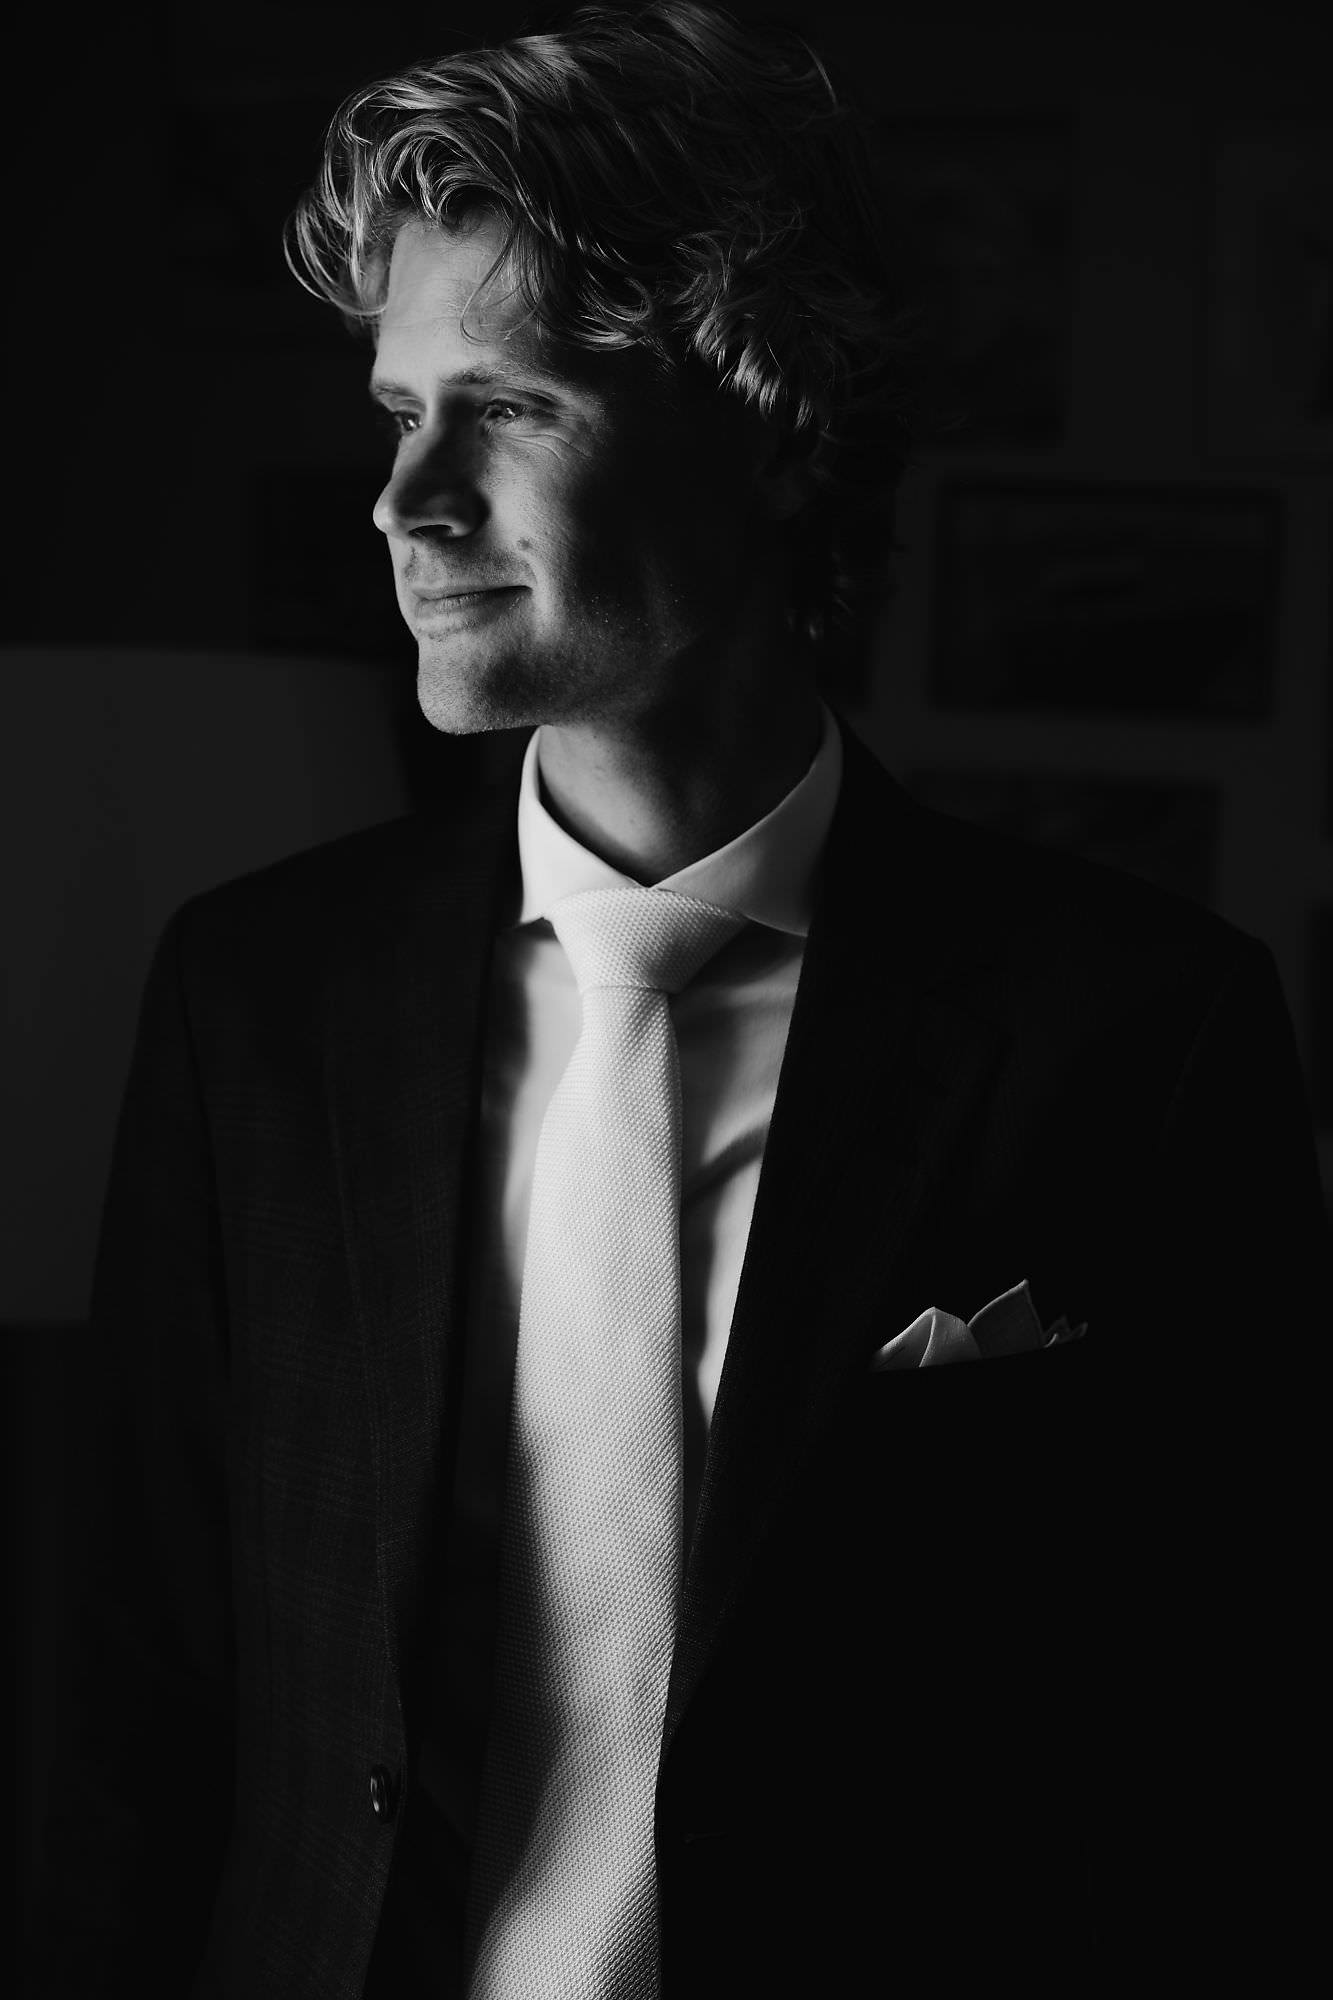 groom prep portrait in utrecht by mark hadden wedding photographer